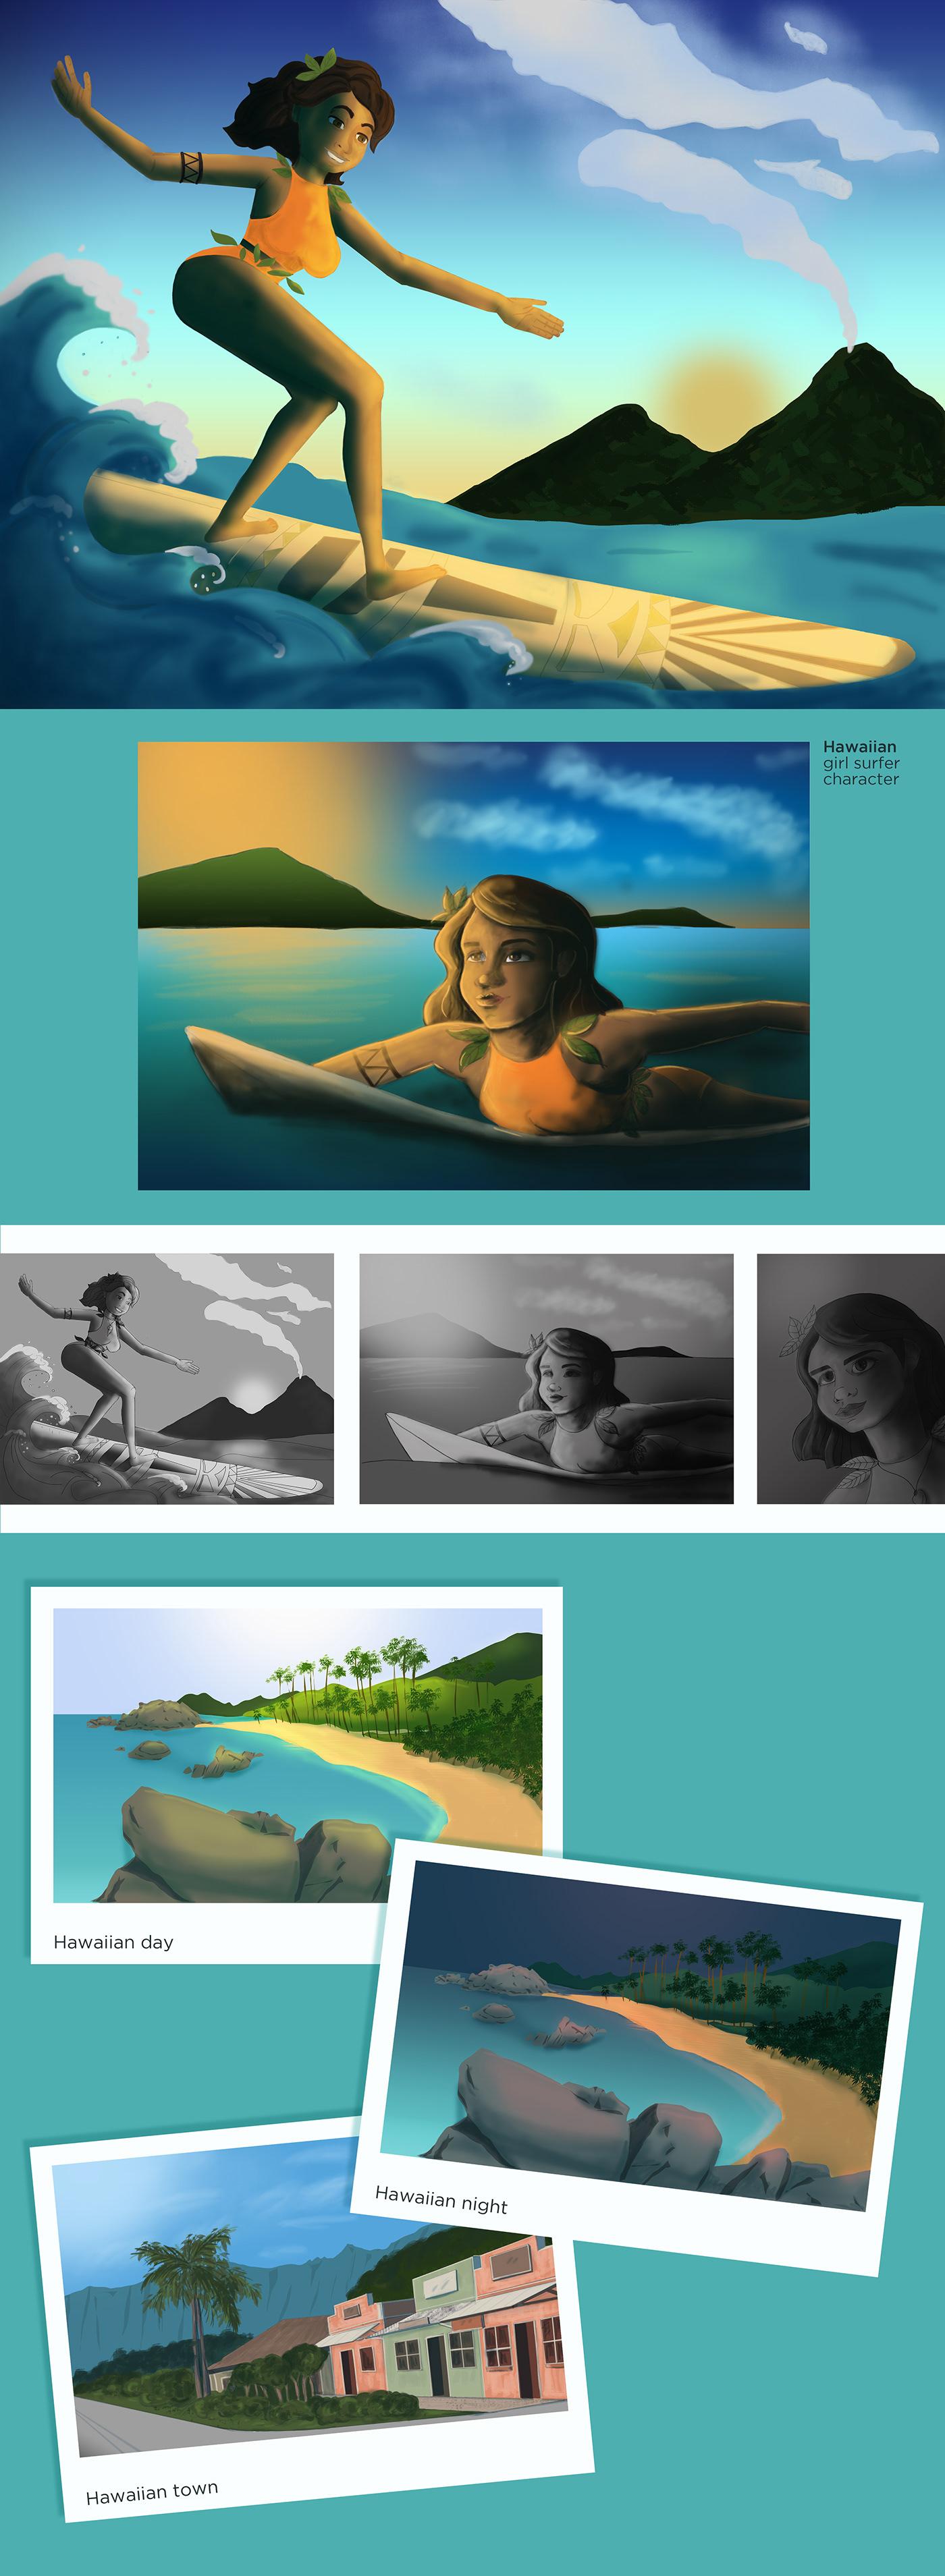 Image may contain: cartoon, human face and swimming